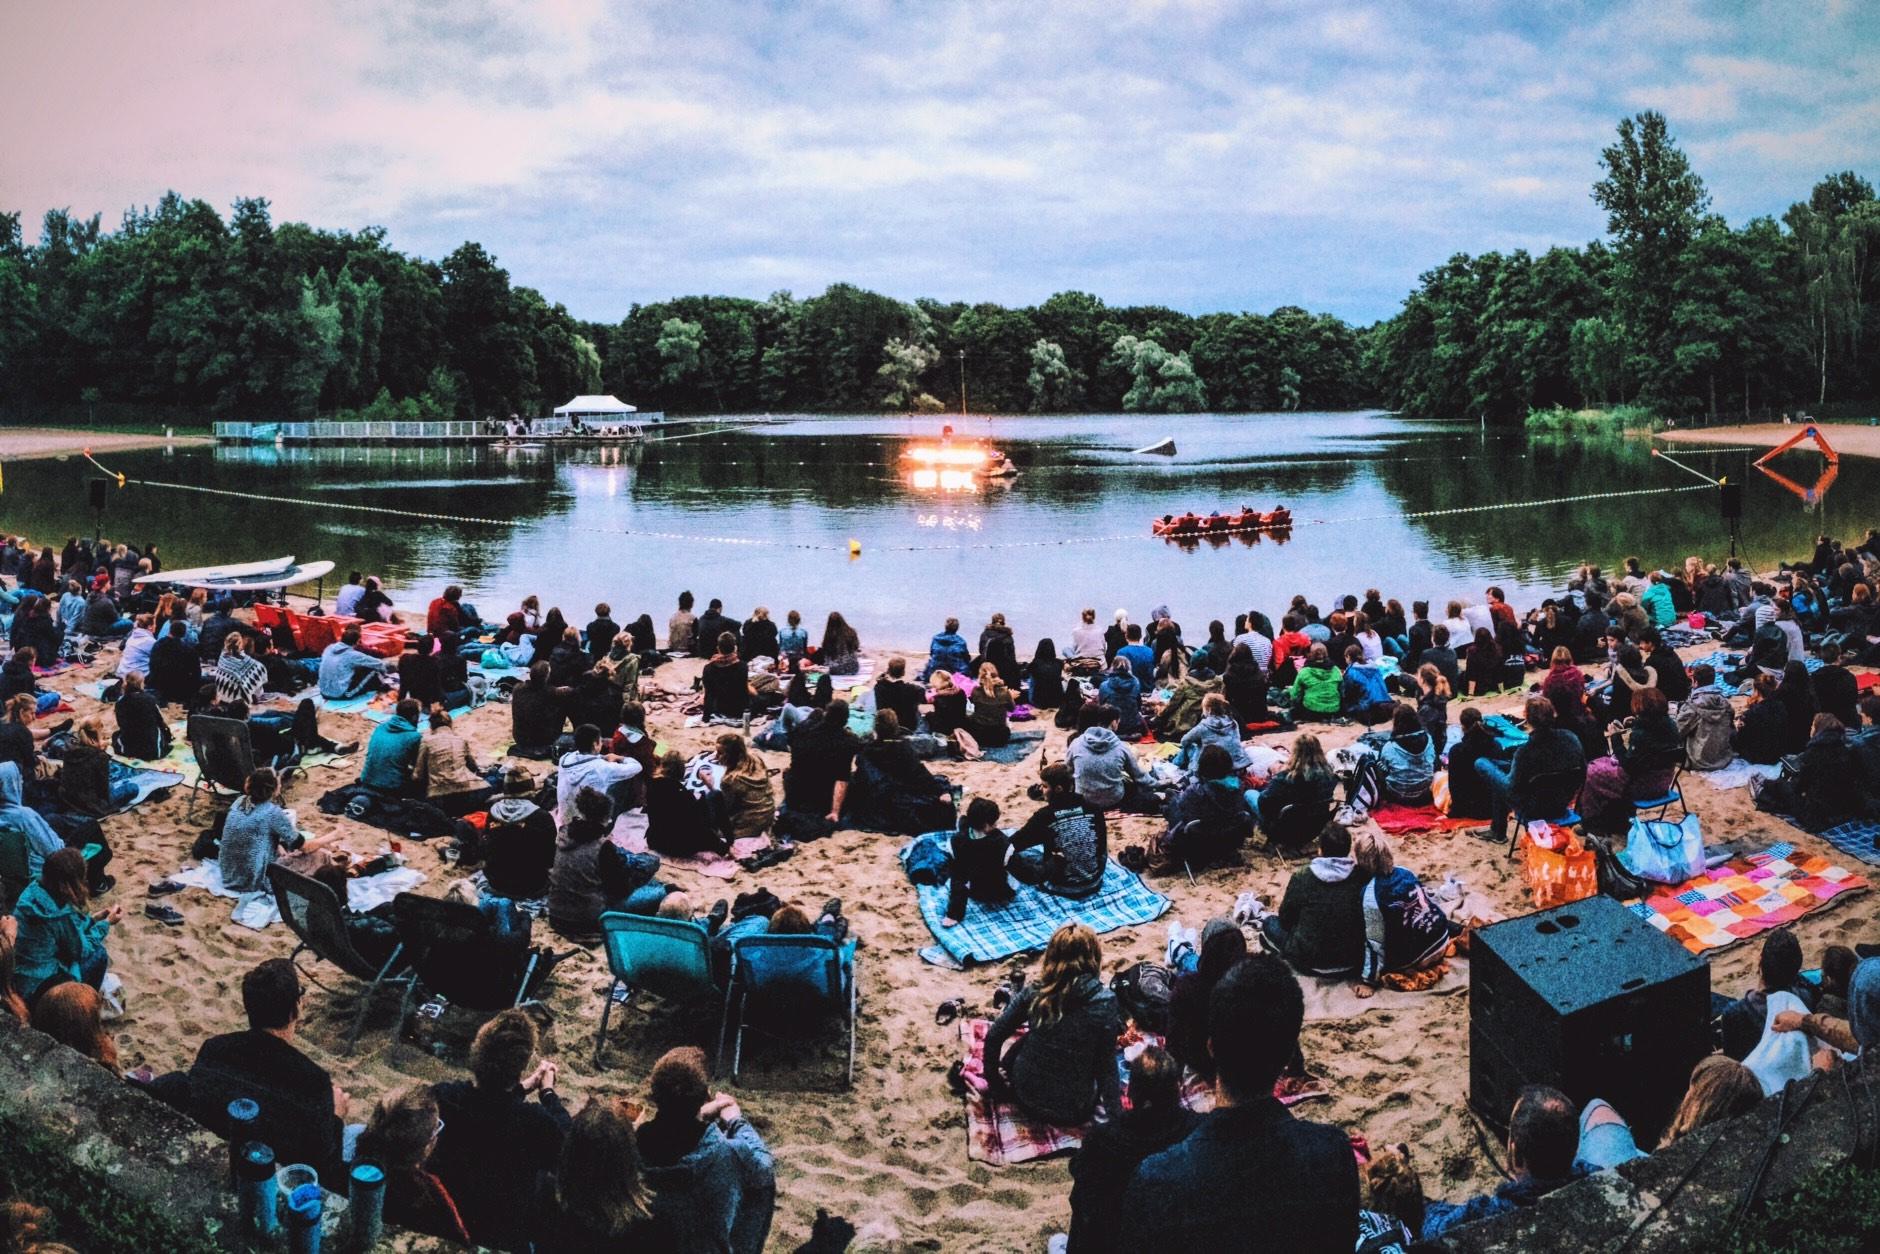 der beste Poetry Slam der Welt - Open Air am Strand - Strandbad Jungfernheide Berlin